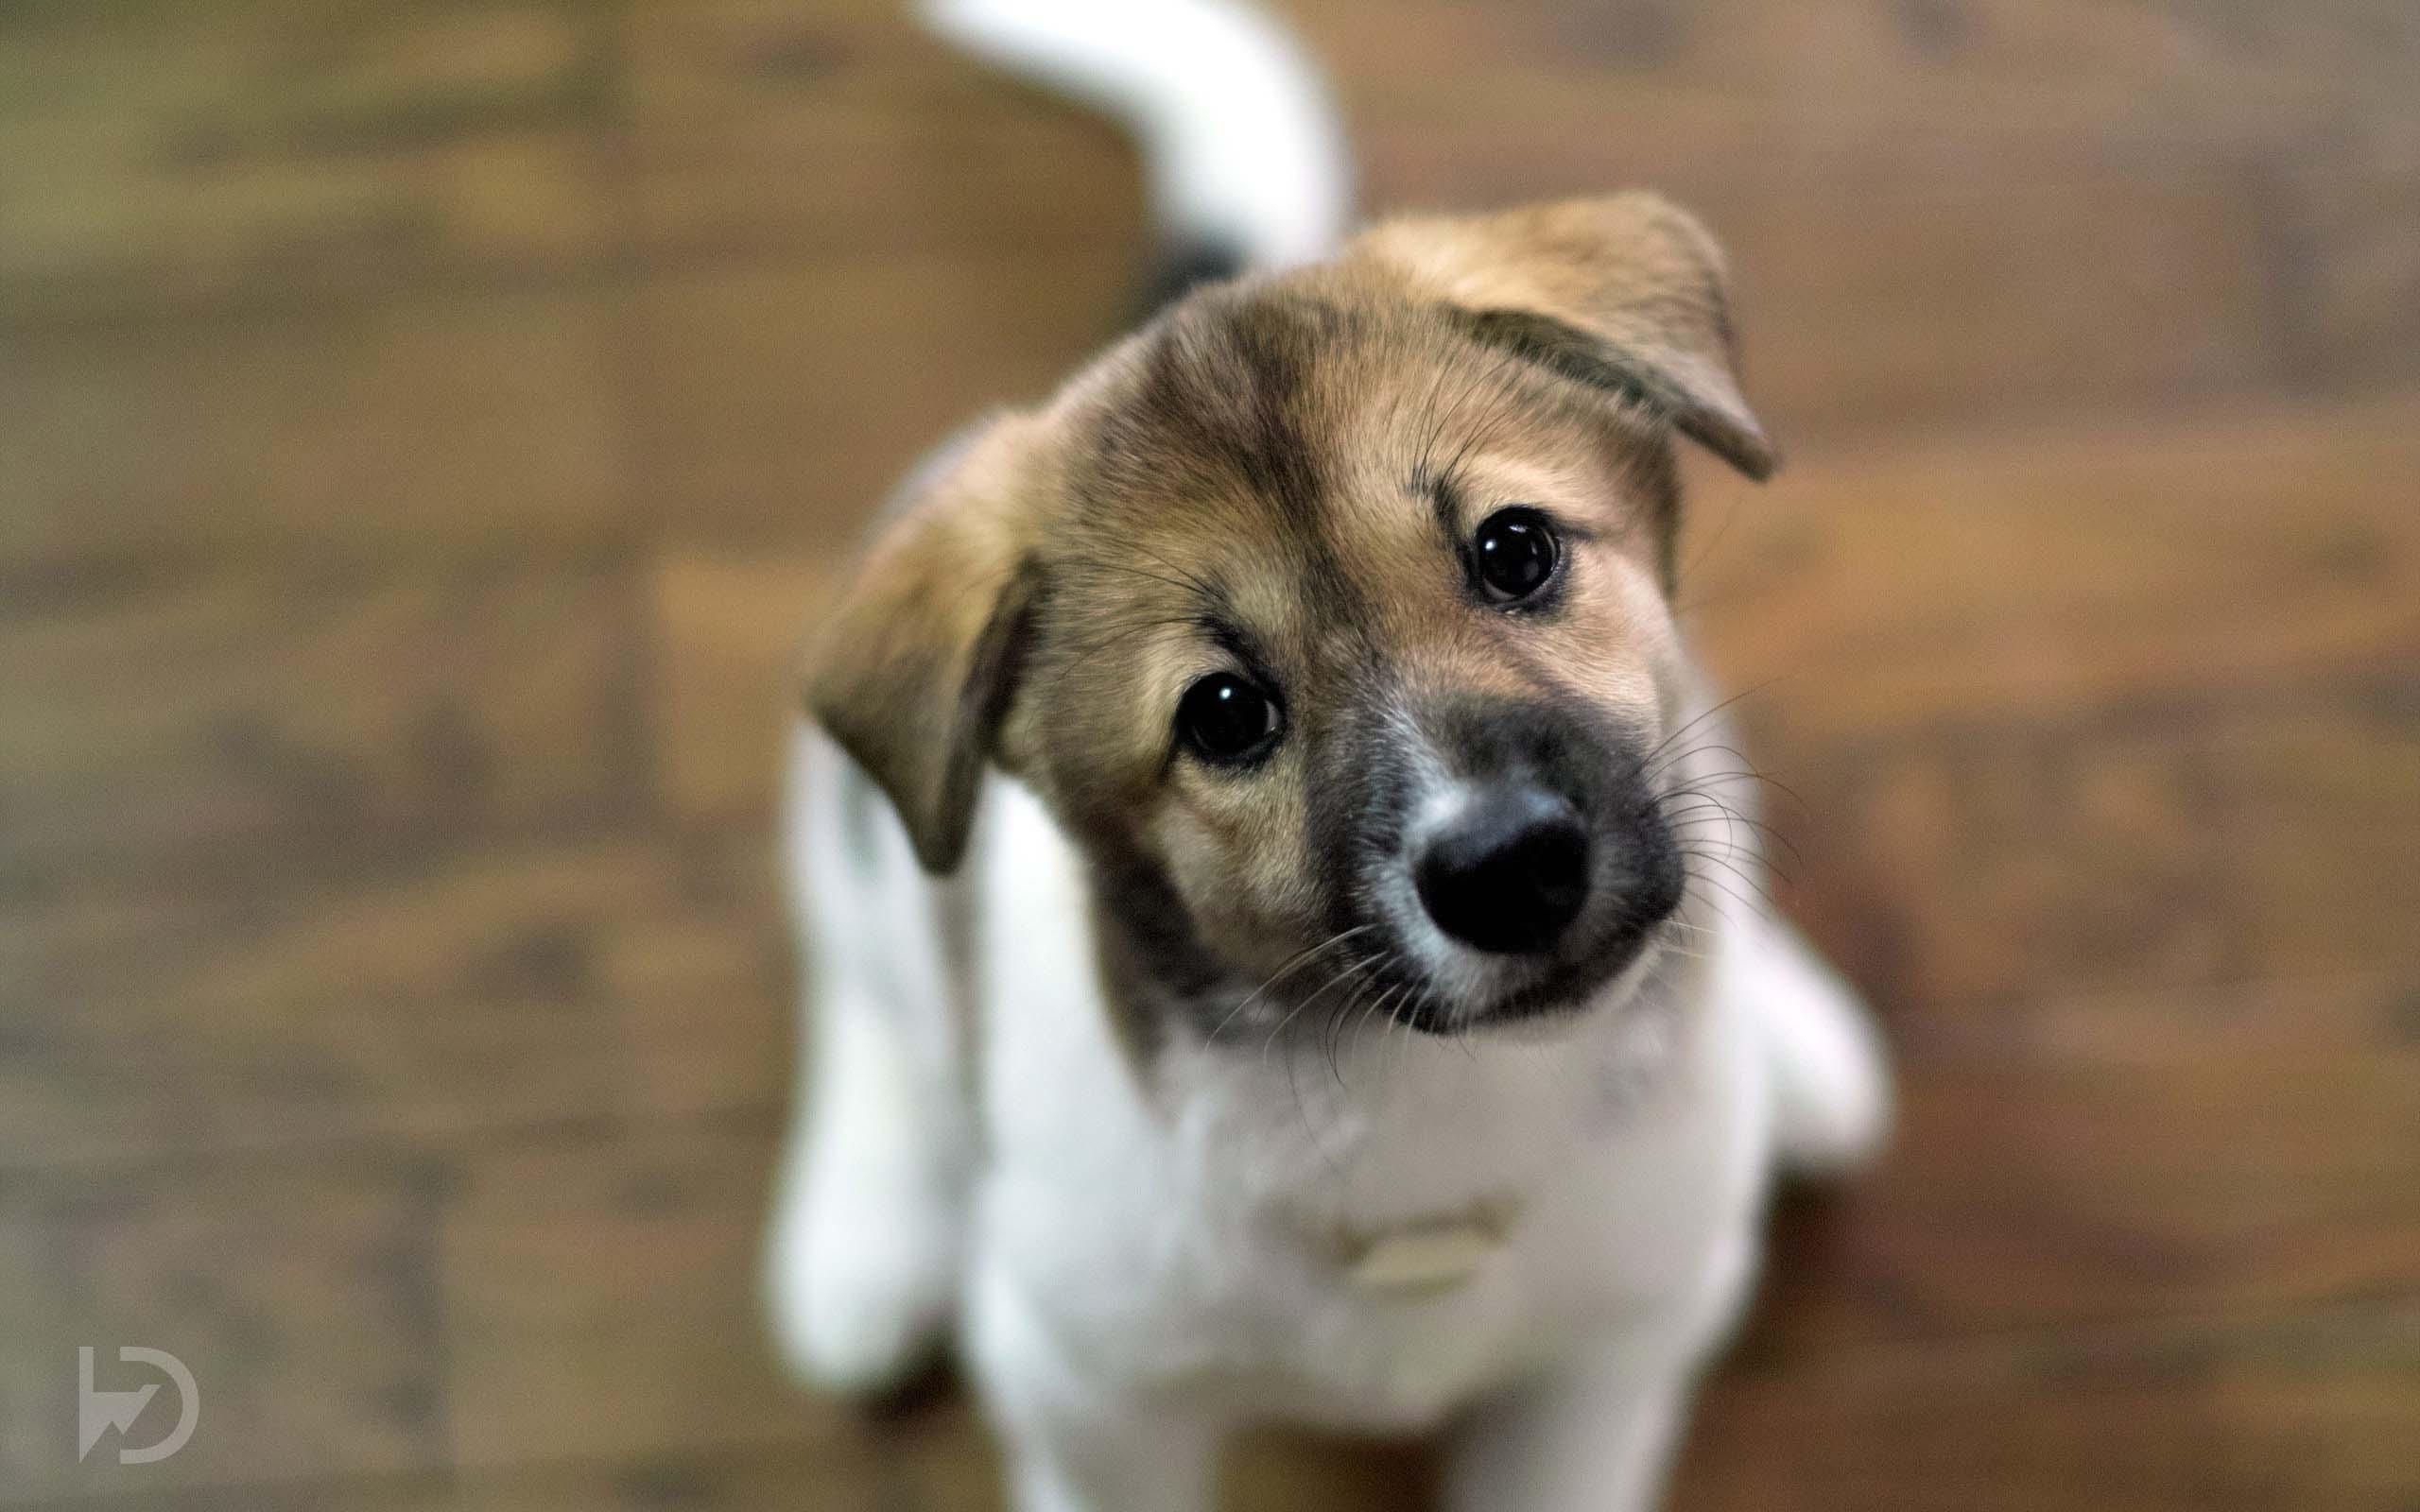 48] Cute Puppy Wallpaper HD on WallpaperSafari 2560x1600